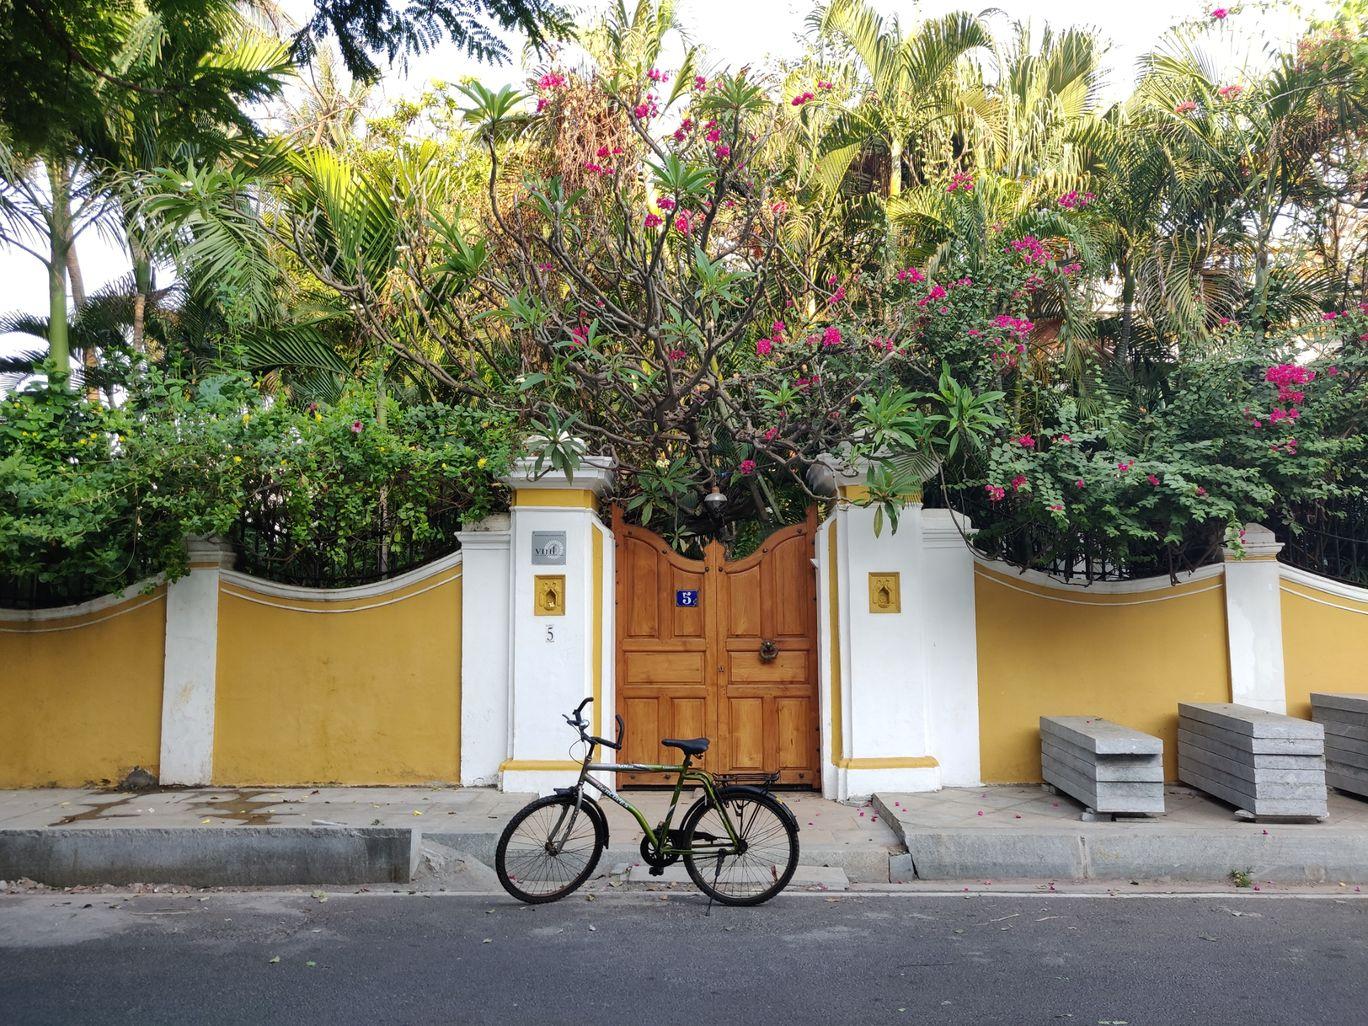 Photo of Pondicherry By Sarthak Gulati